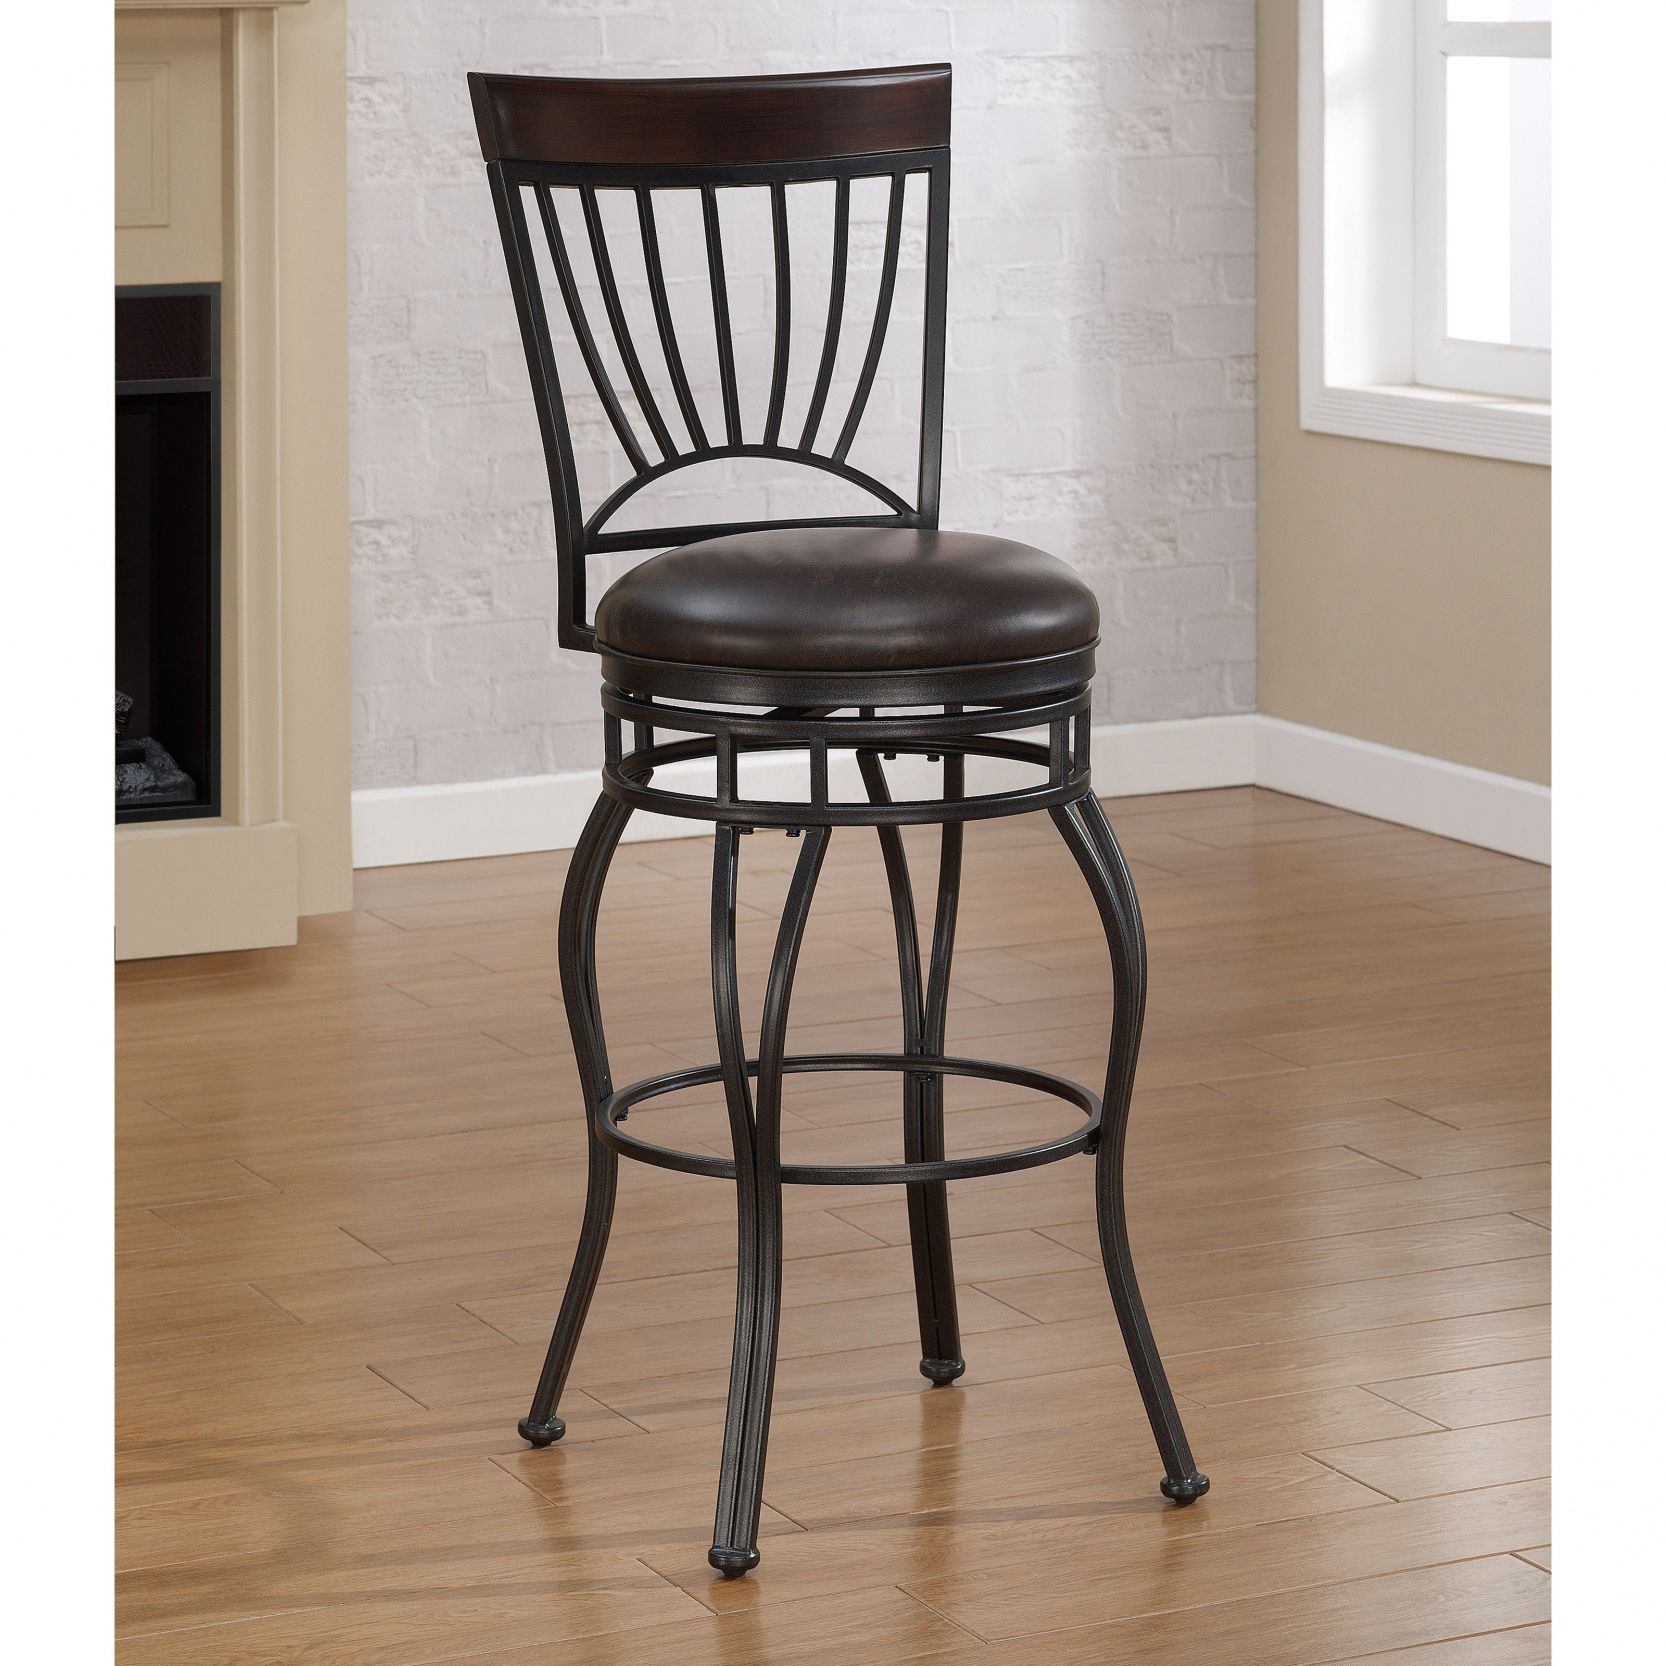 2019 36 Inch Bar Stools Cheap Modern Design Furniture Check More